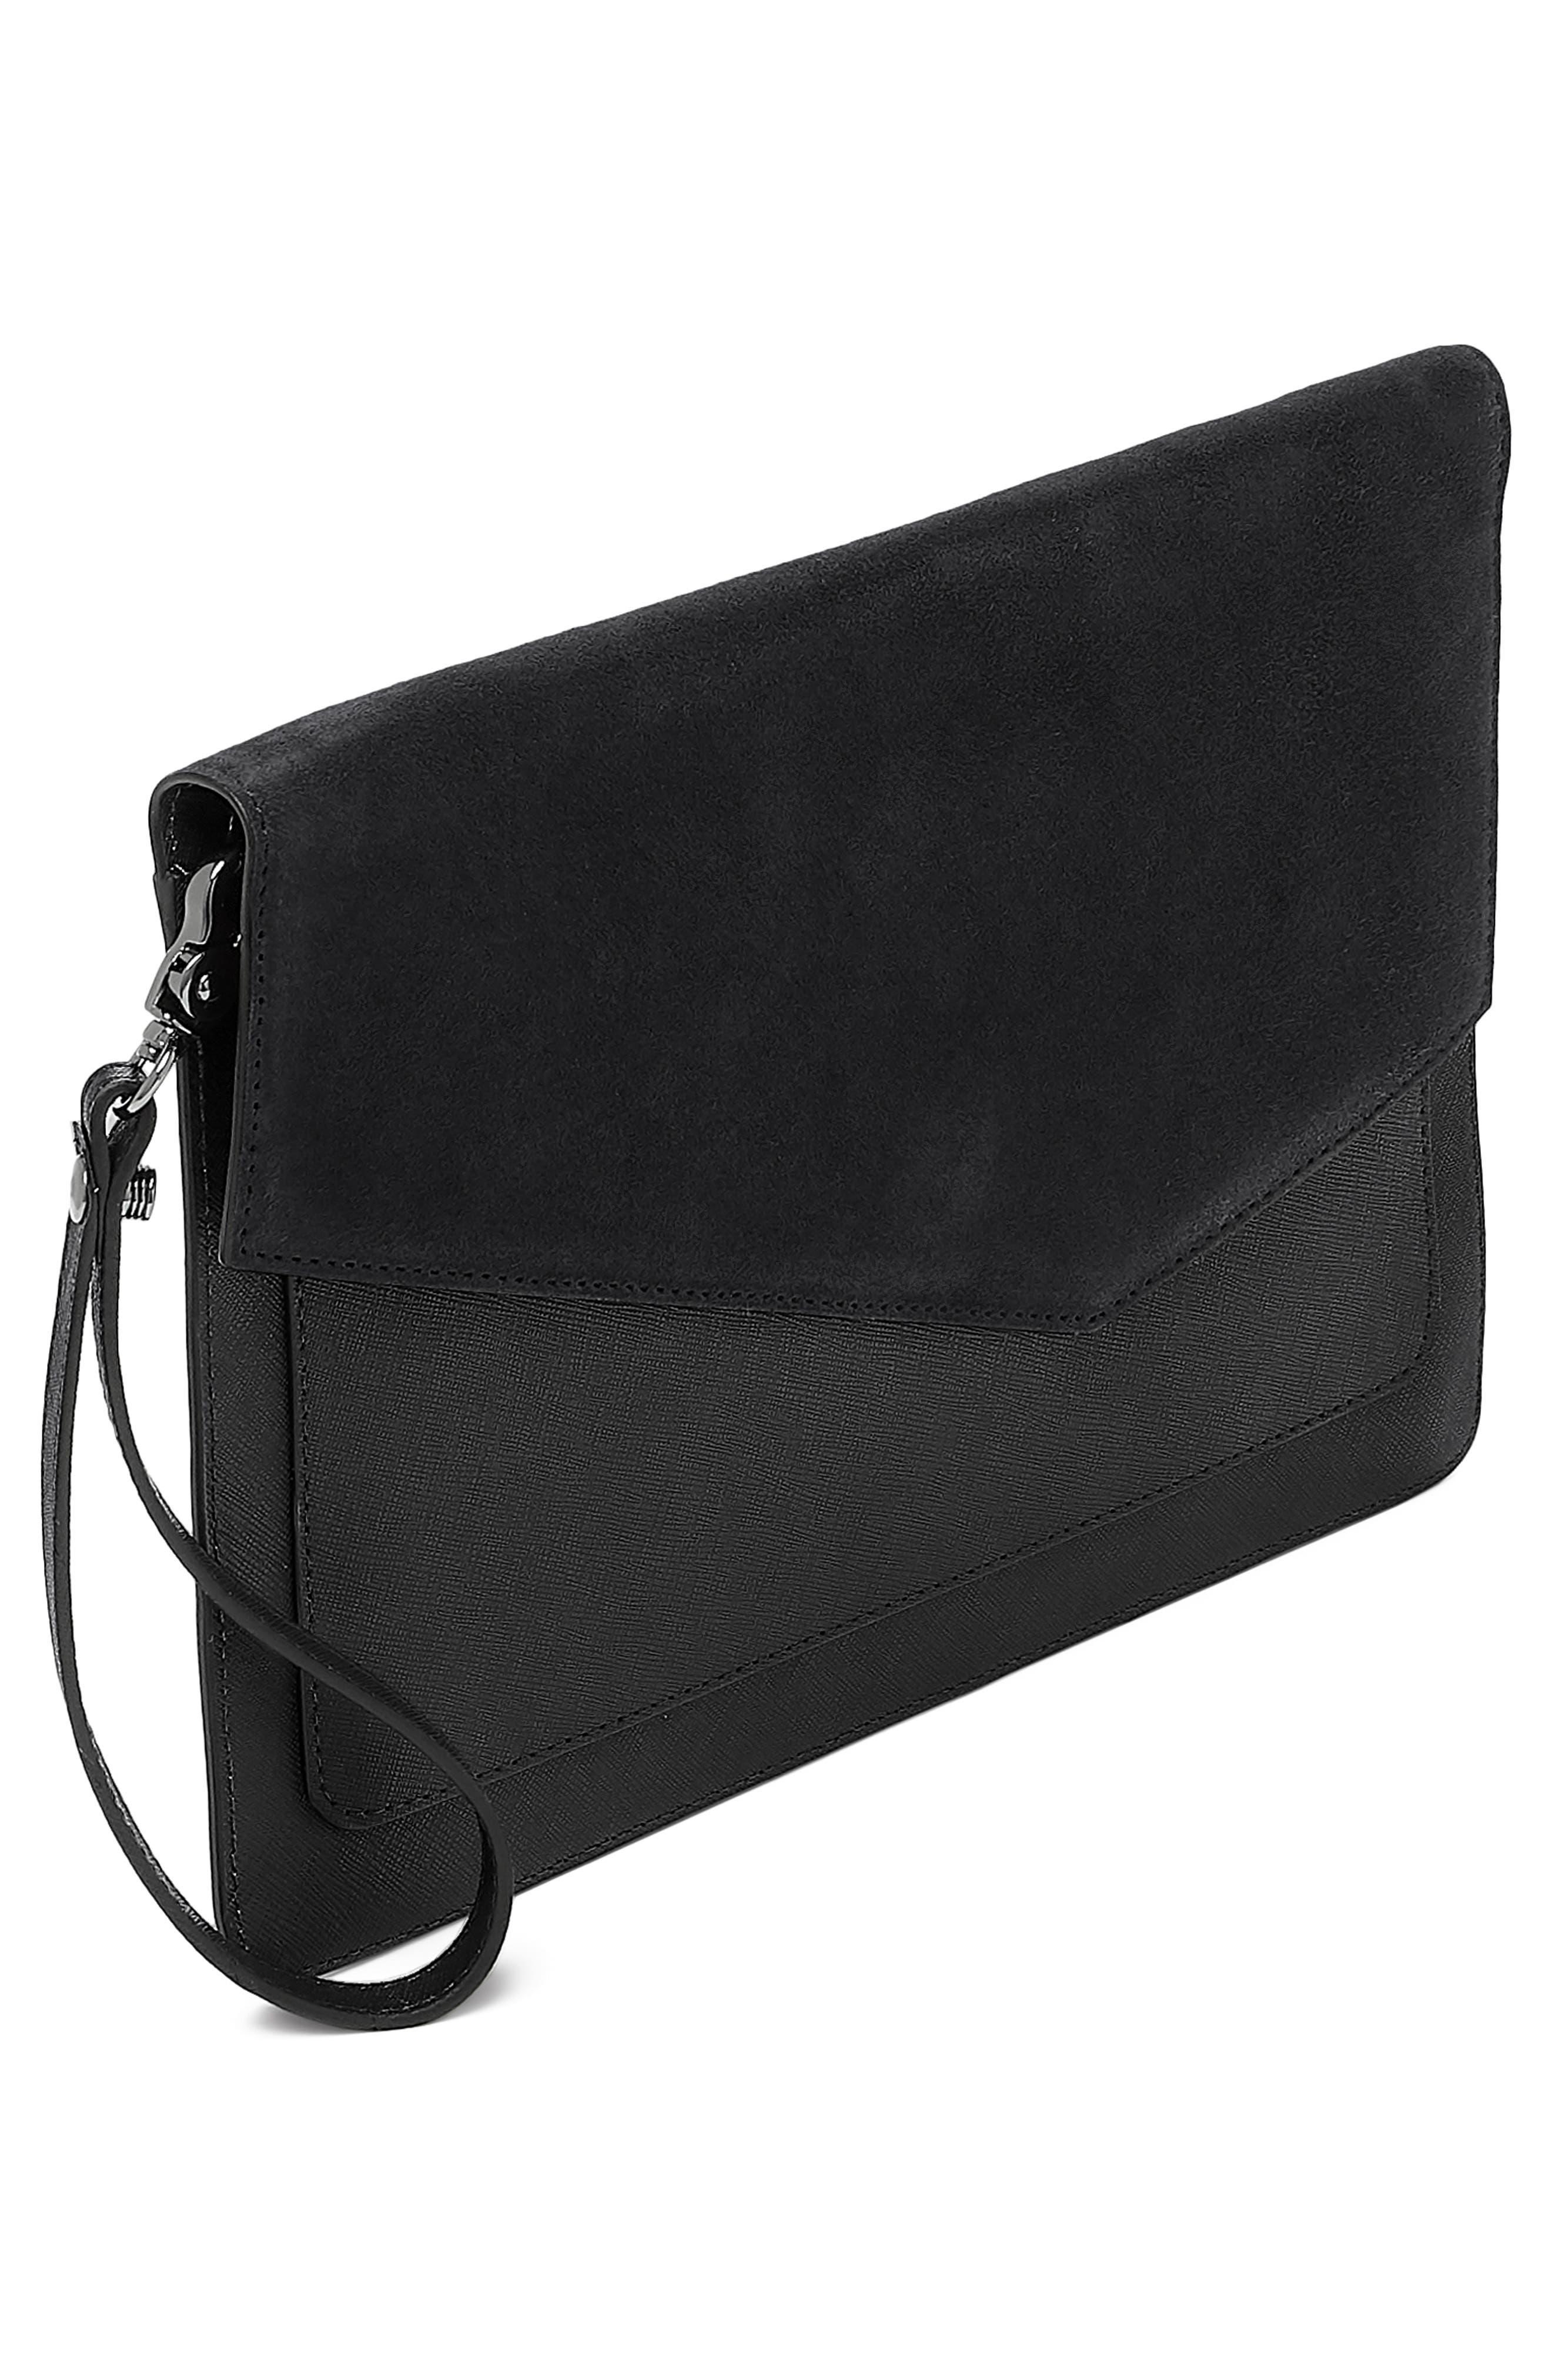 Cobble Hill Calfskin Leather Flap Clutch,                             Alternate thumbnail 4, color,                             BLACK